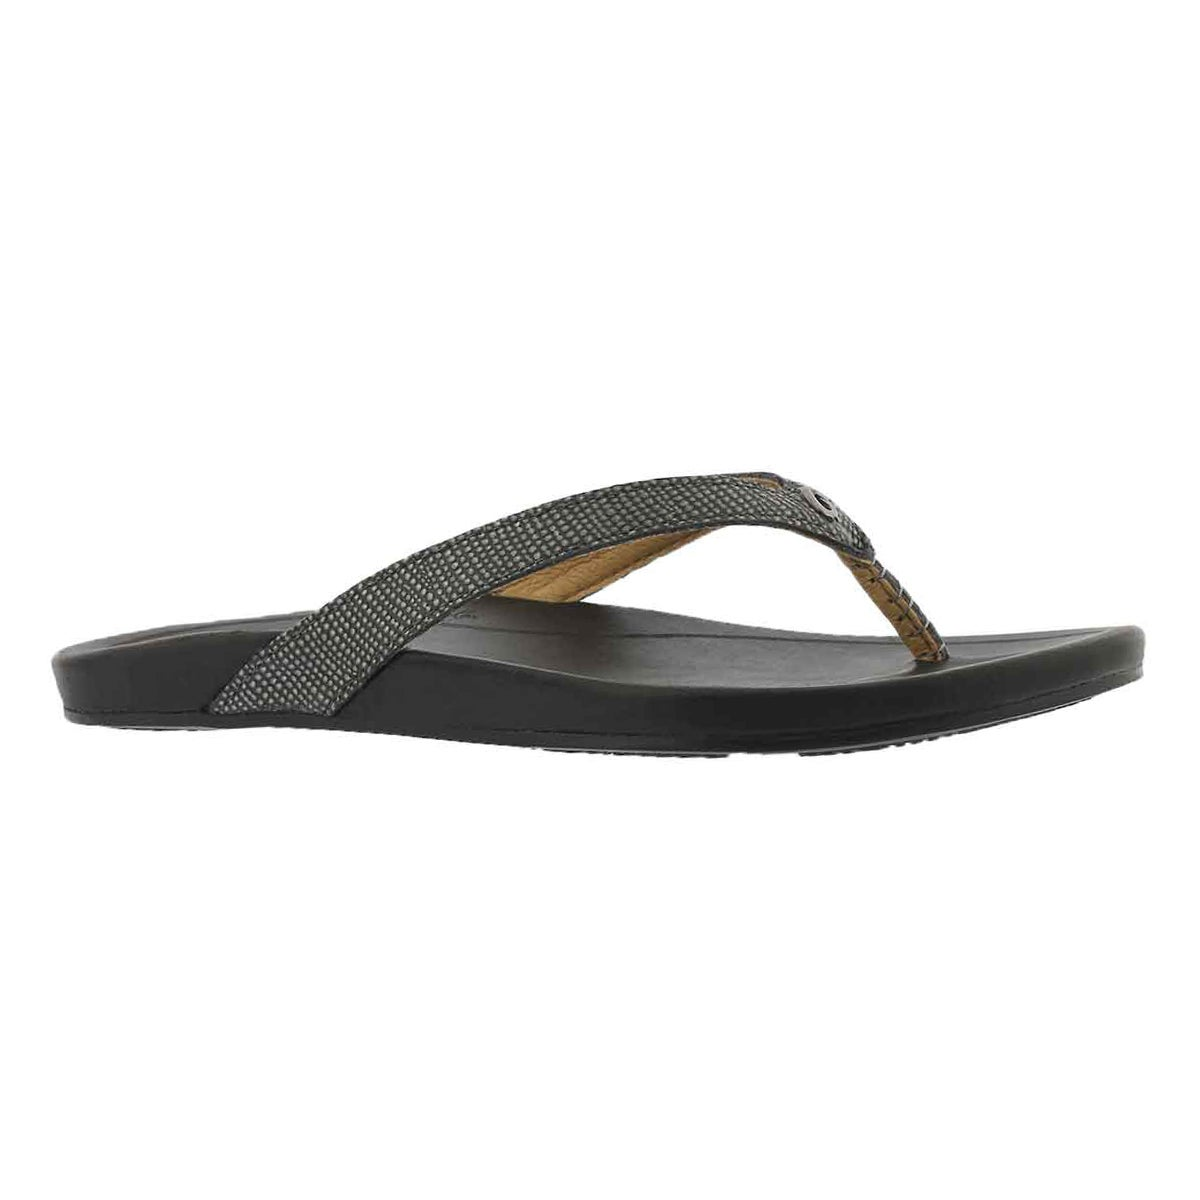 Lds Hi'ona pewter/blk thong sandal